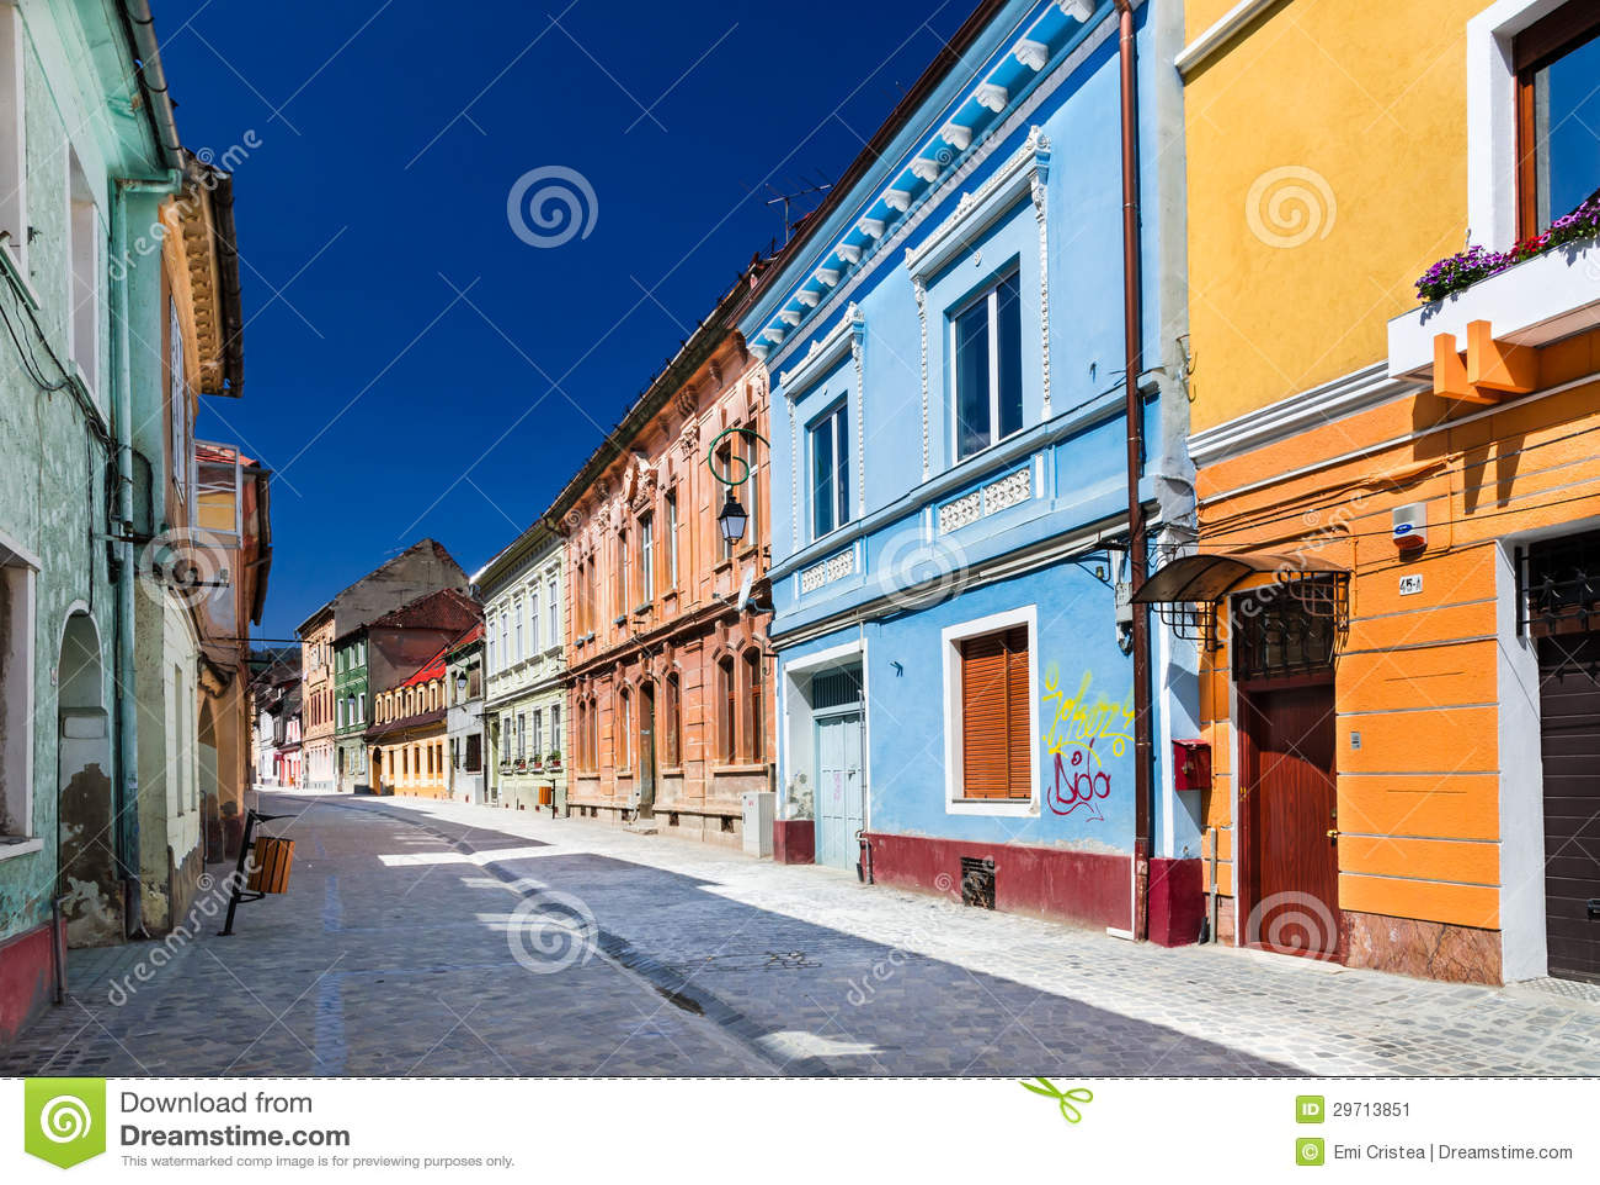 Medieval street in brasov romania stock image image 29713851 - Saxon style houses in transylvania ...